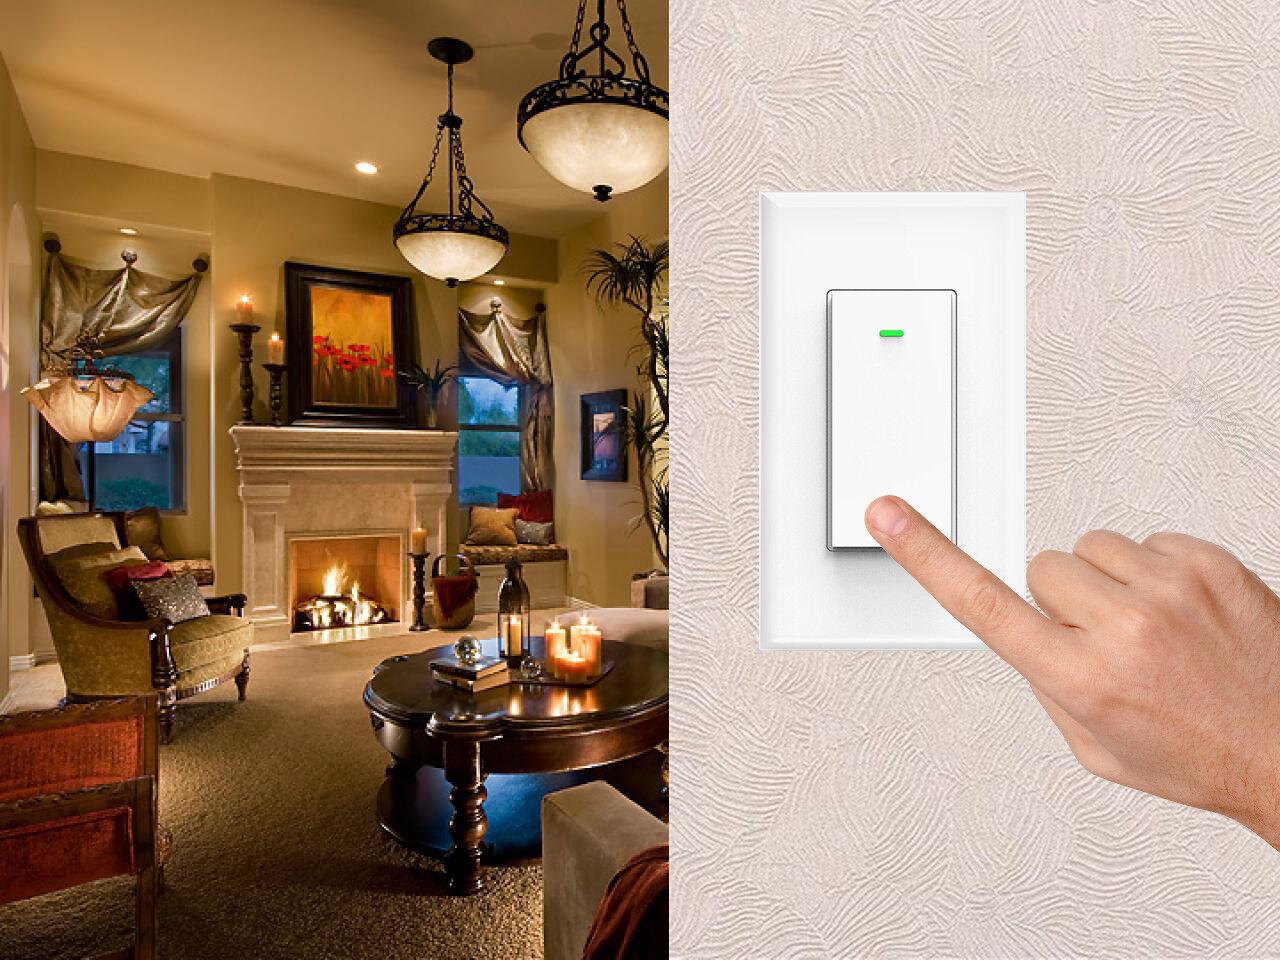 как выглядит Smart WIFI Light Switch Remote Alexa Google Home Voice Control Smart Life 2pack фото